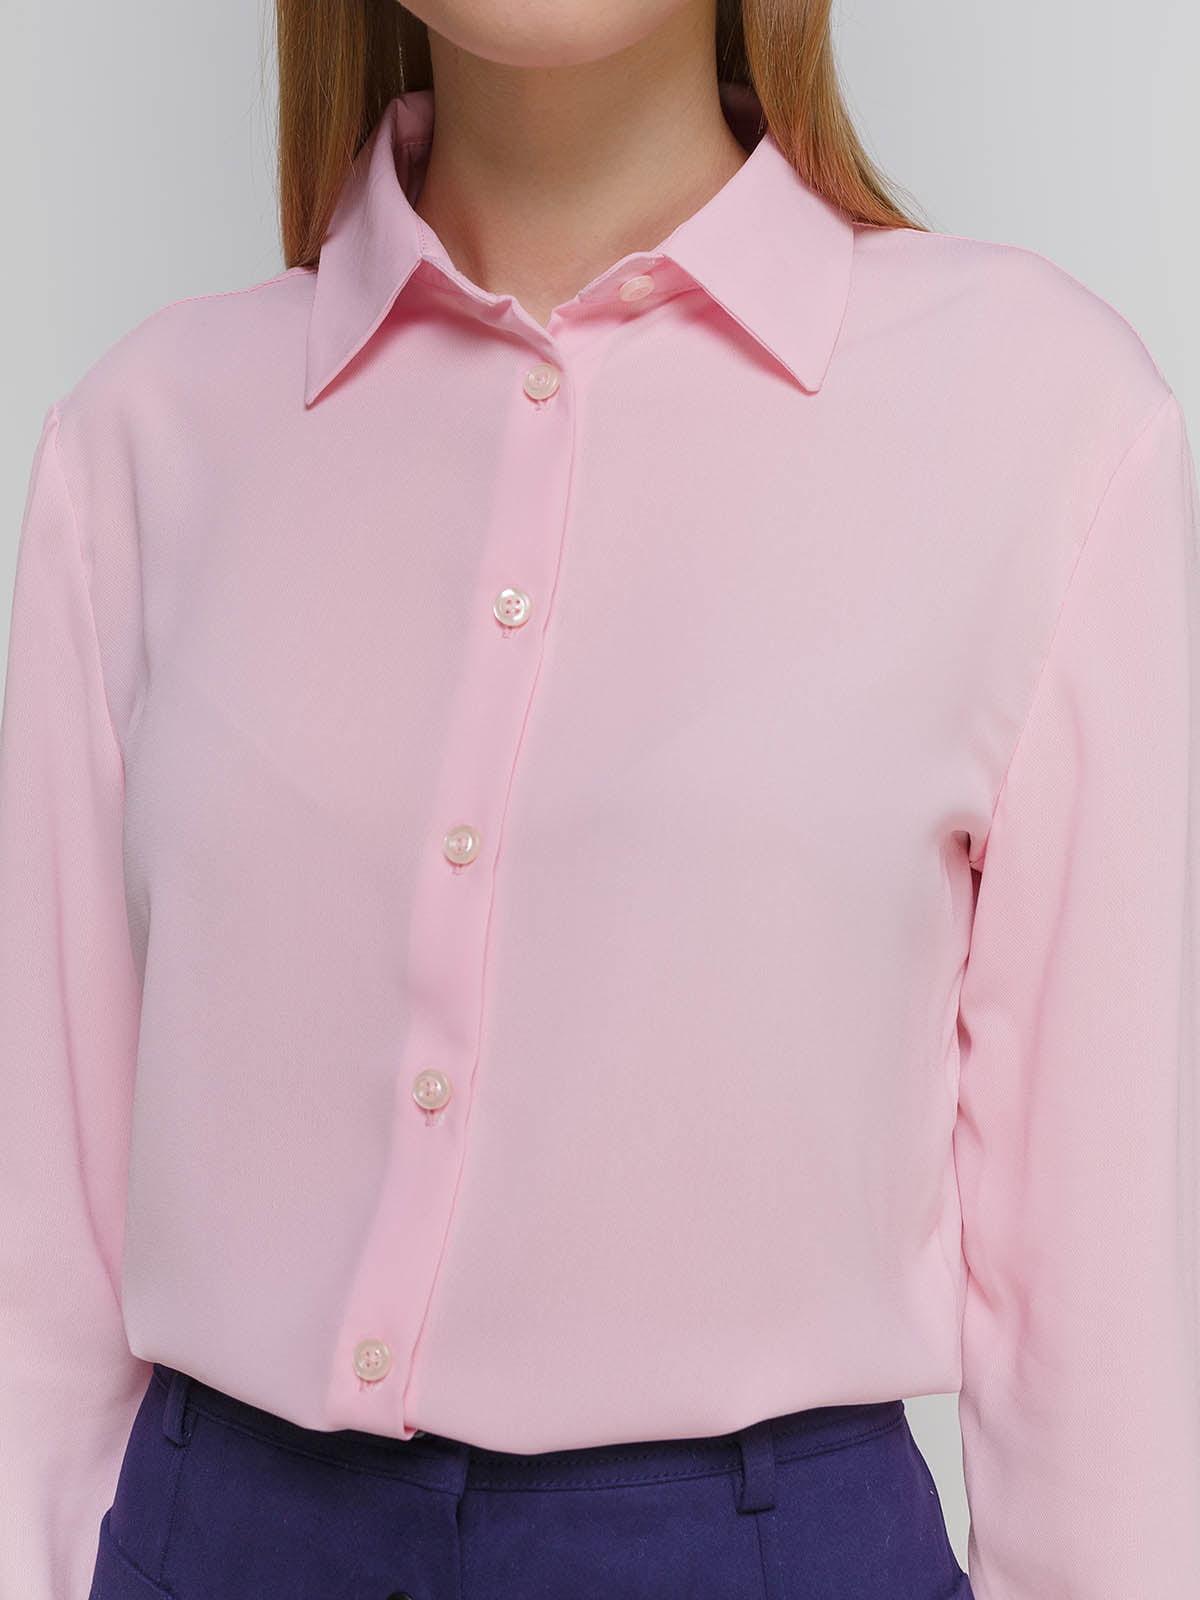 Рубашка розовая   4695434   фото 3